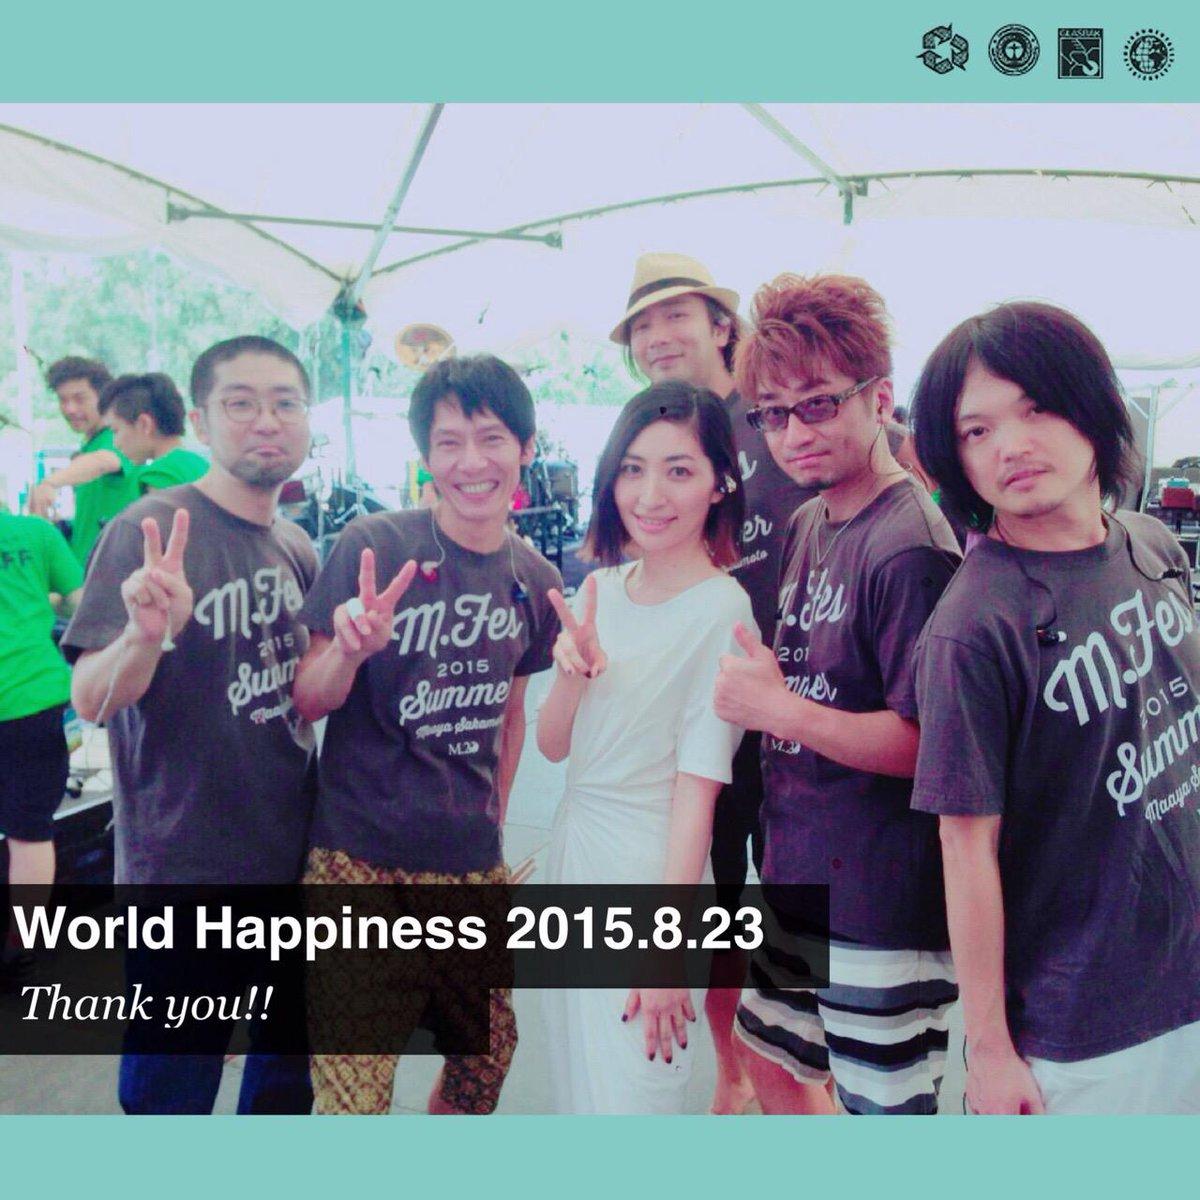 坂本真綾 WORLD HAPPINESS 2015 千ケ崎学(B)、佐野康夫(Drs)、松本圭司(Key)、北川勝利(Gt)、松江潤(Gt) http://t.co/bDYks9mhR2